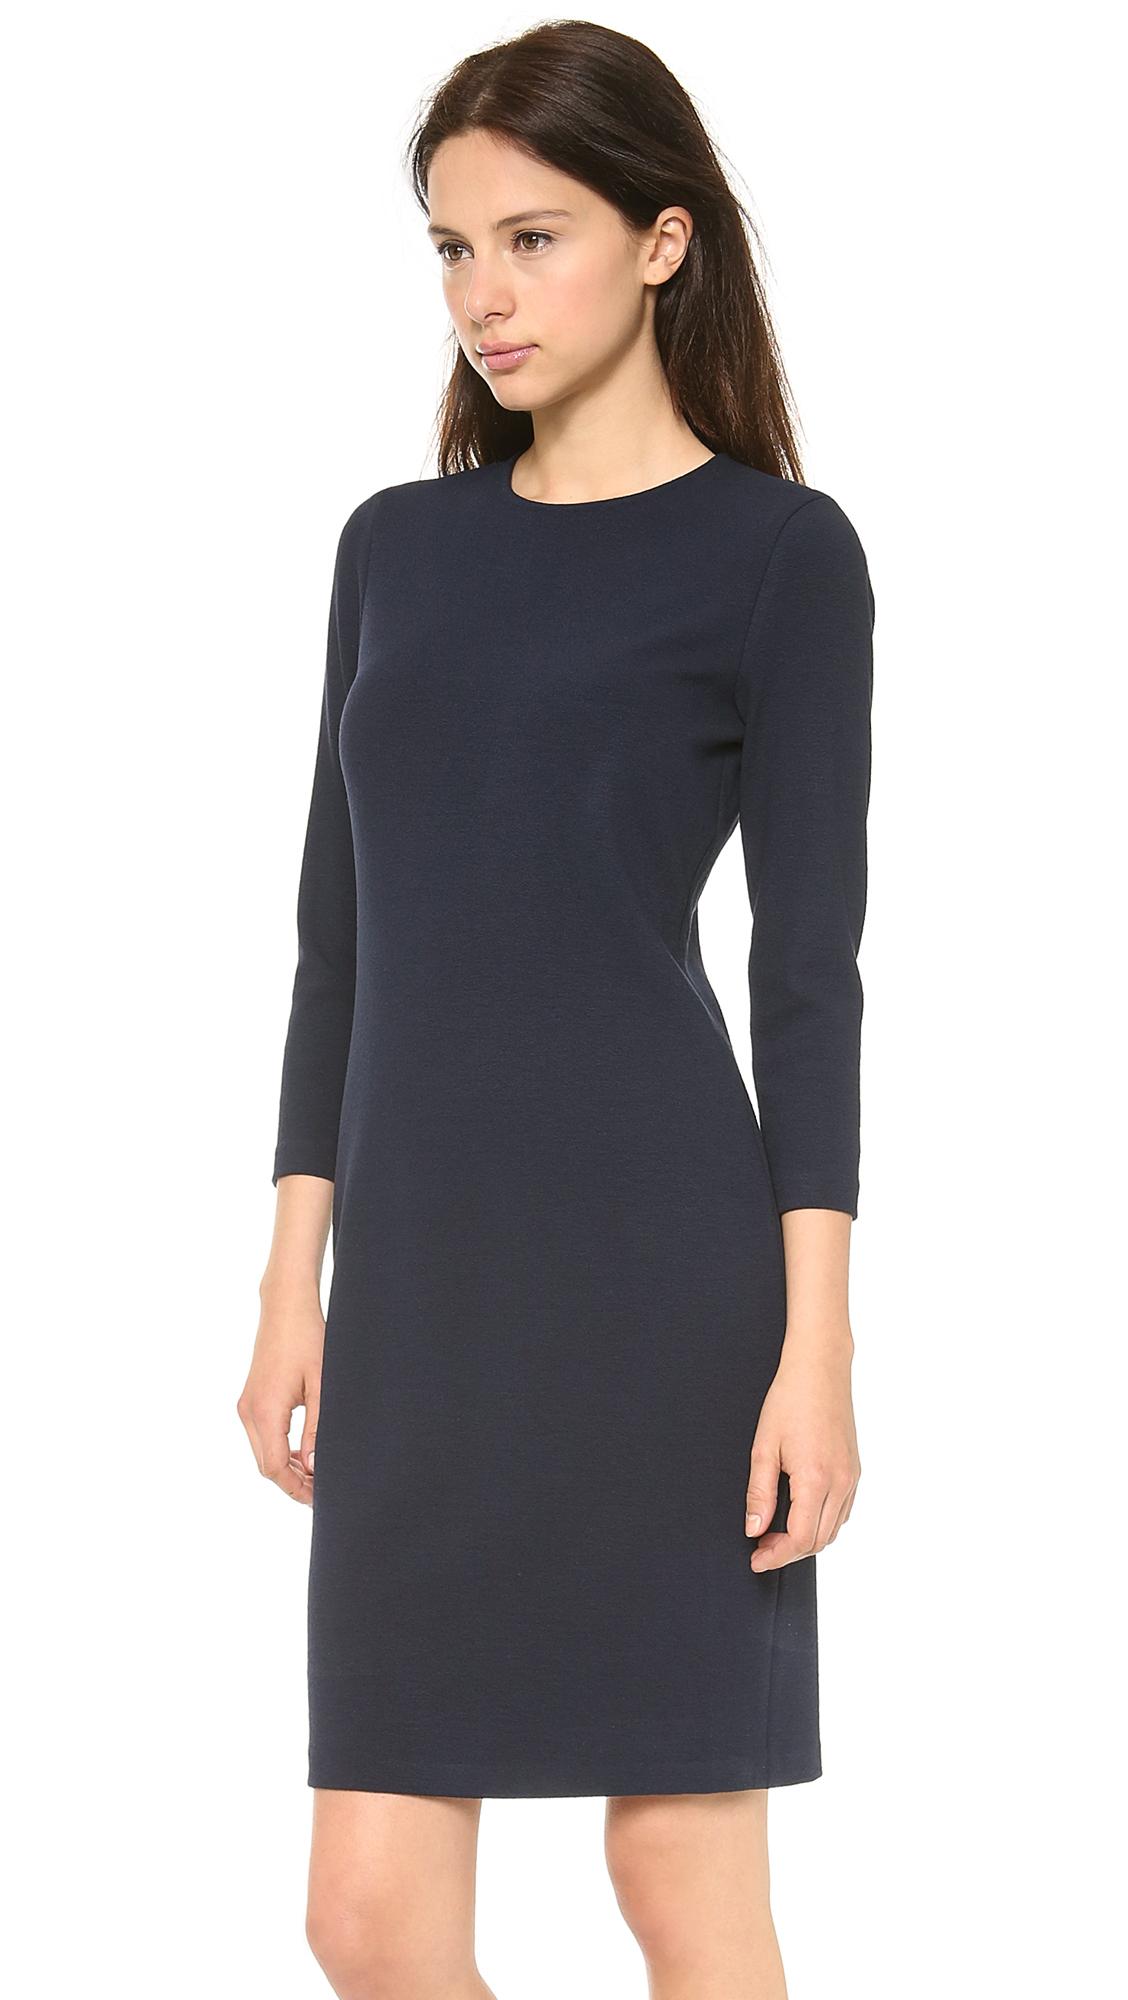 Vince 3/4 Sleeve Pencil Dress in Black (Mallard) | Lyst